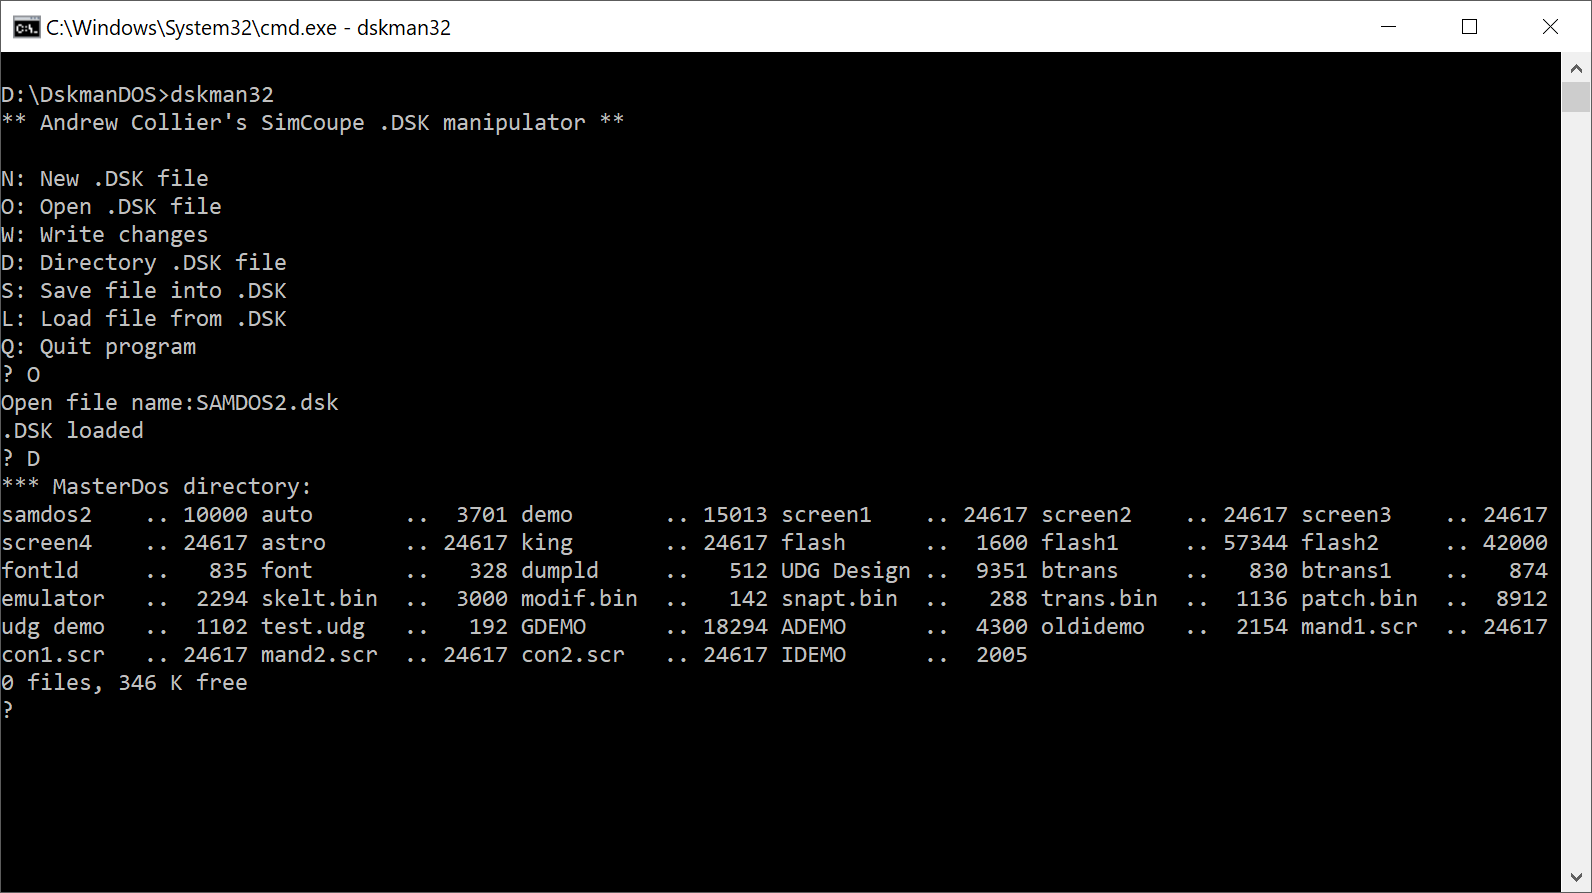 Assembly Code Tools - DiskmanDOS SAMDISK2 Files